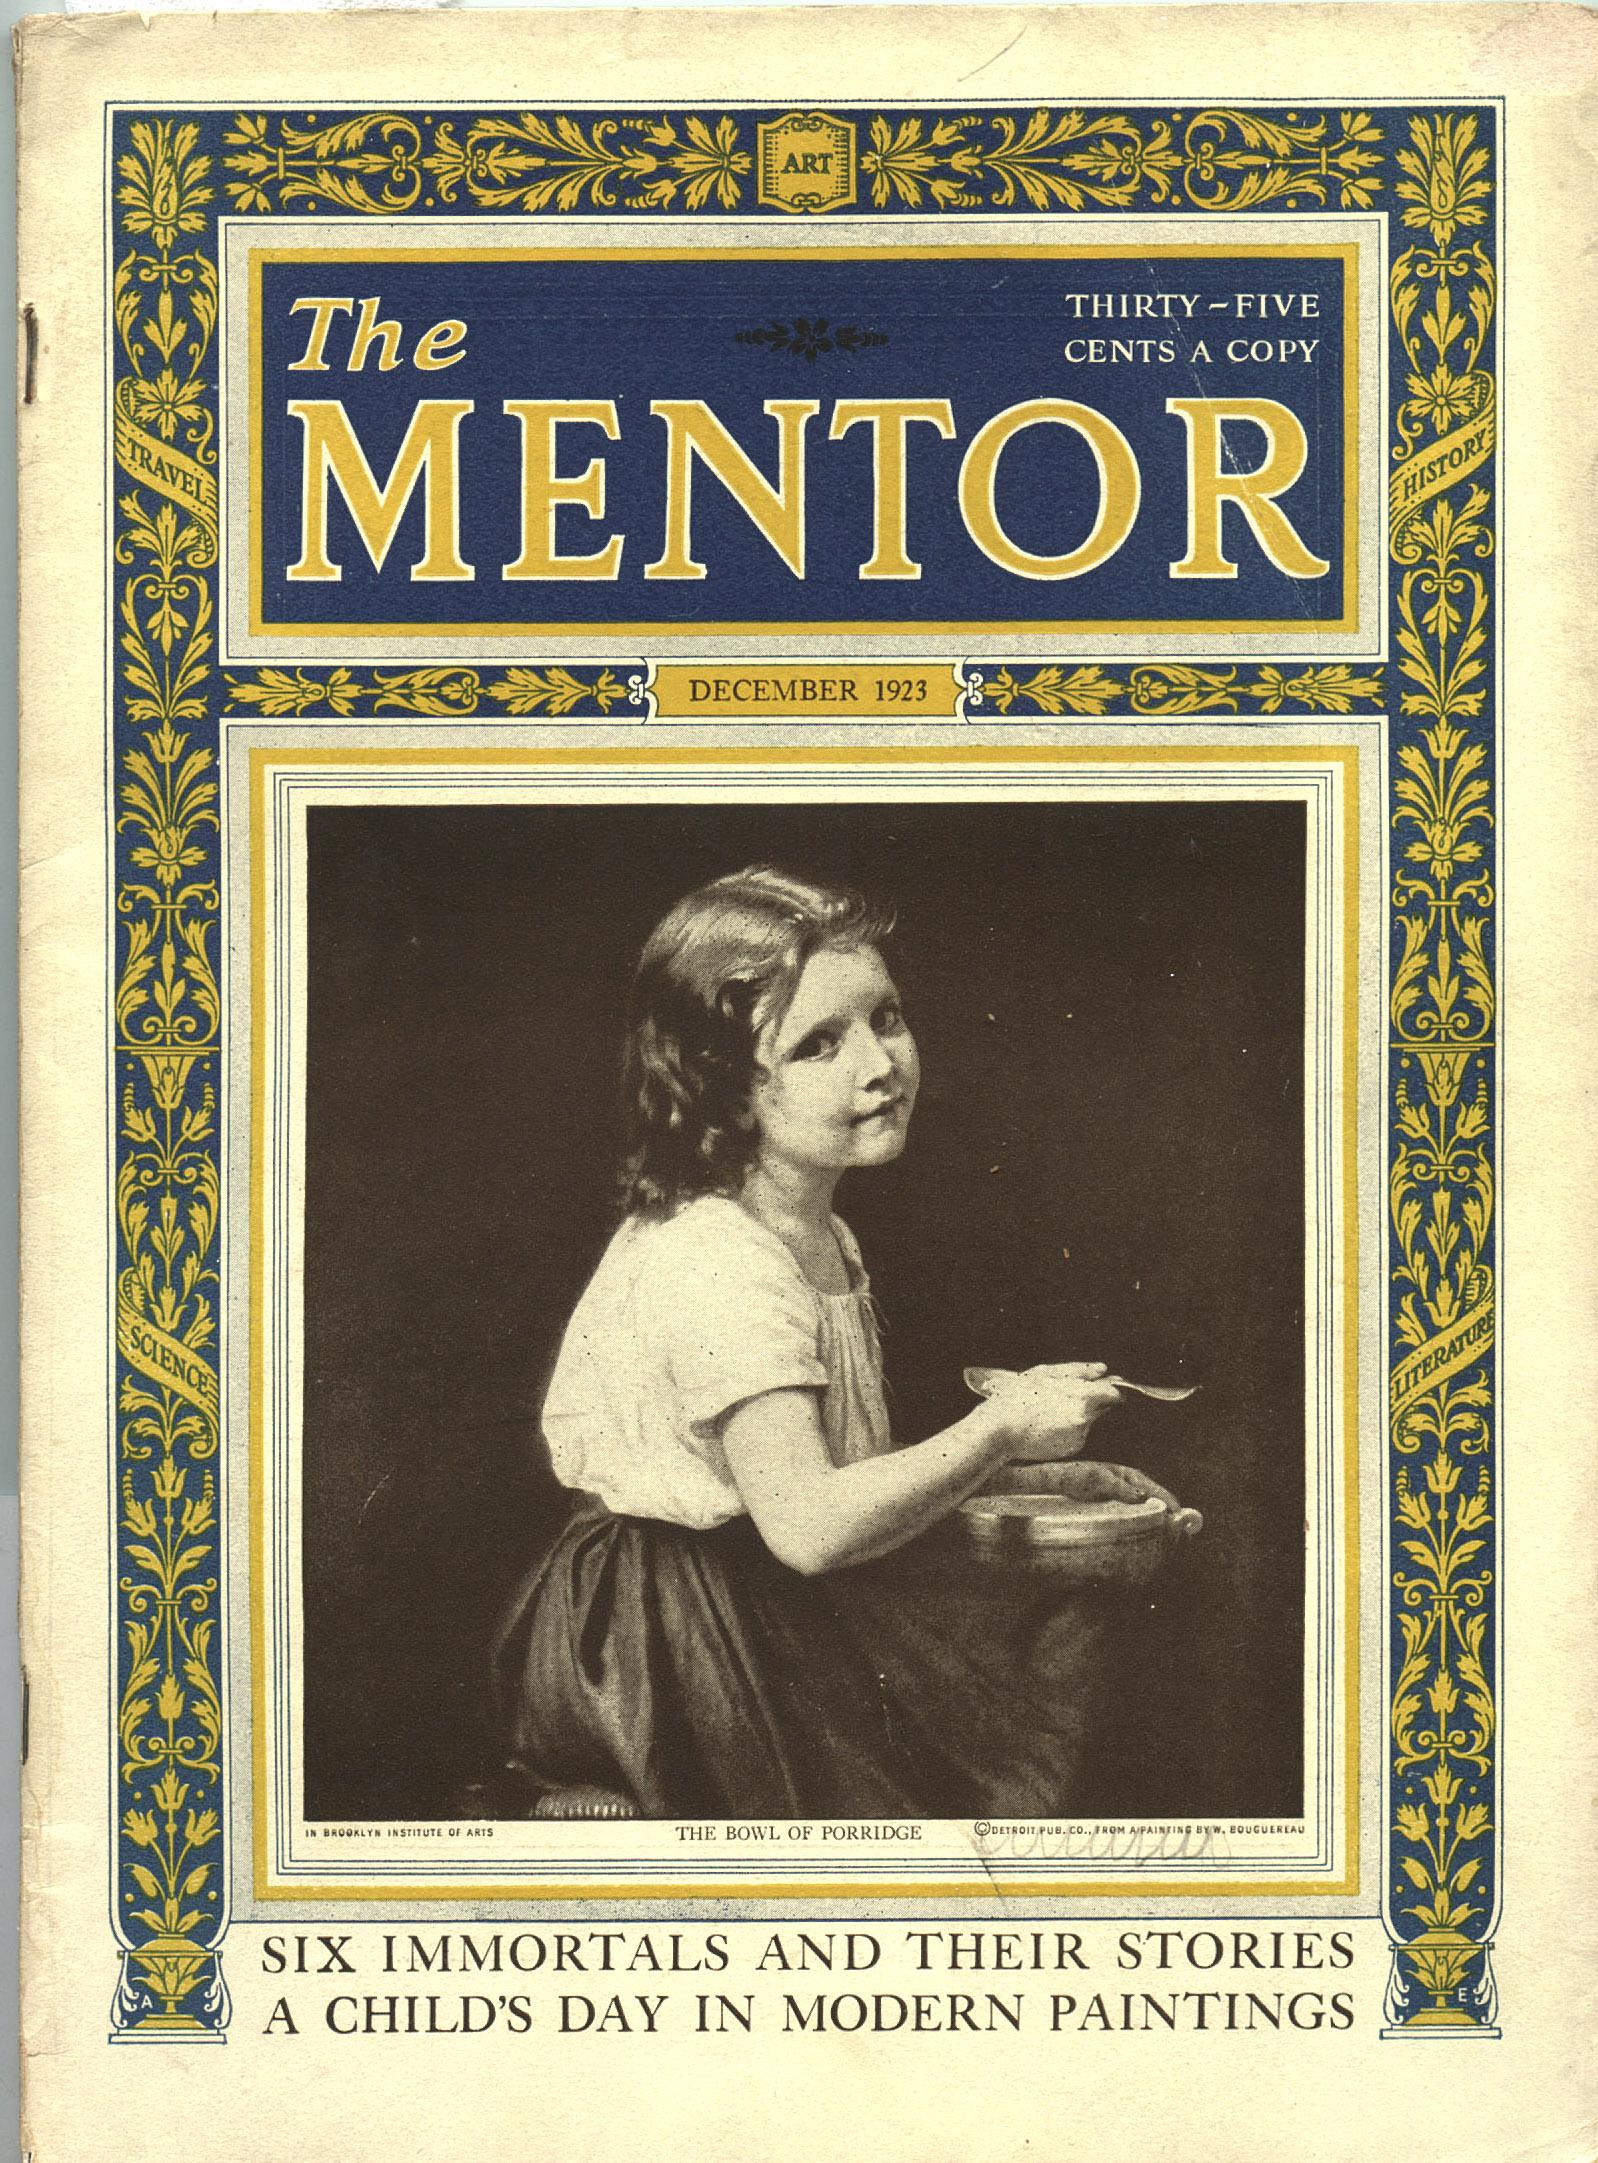 The Mentor Magazine – Inherited Values